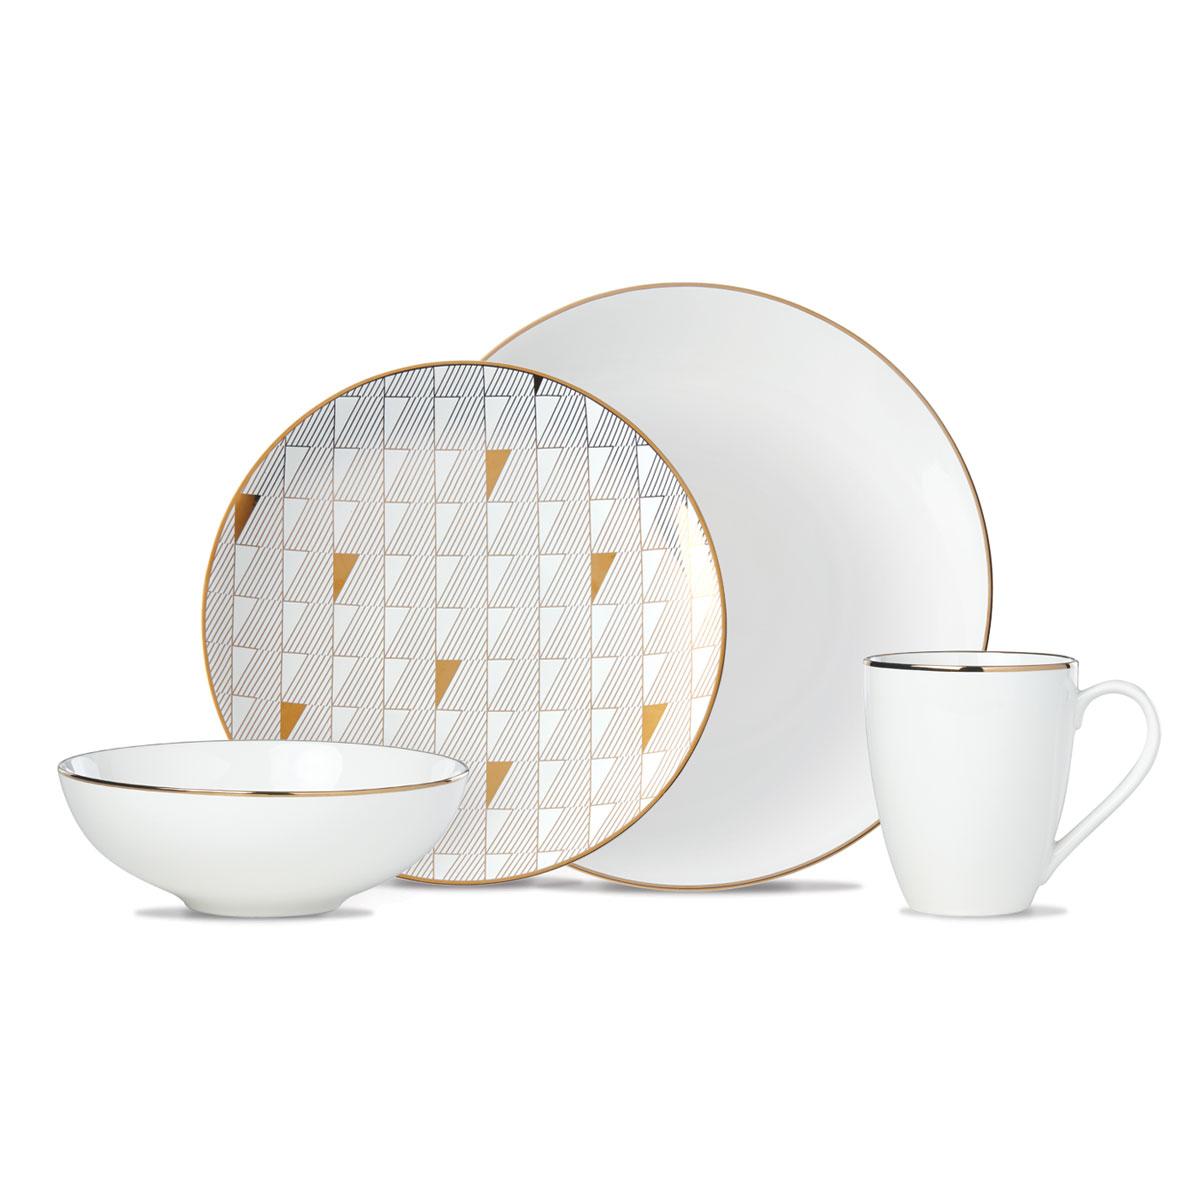 Lenox Trianna White Dinnerware 4 Piece Place Setting